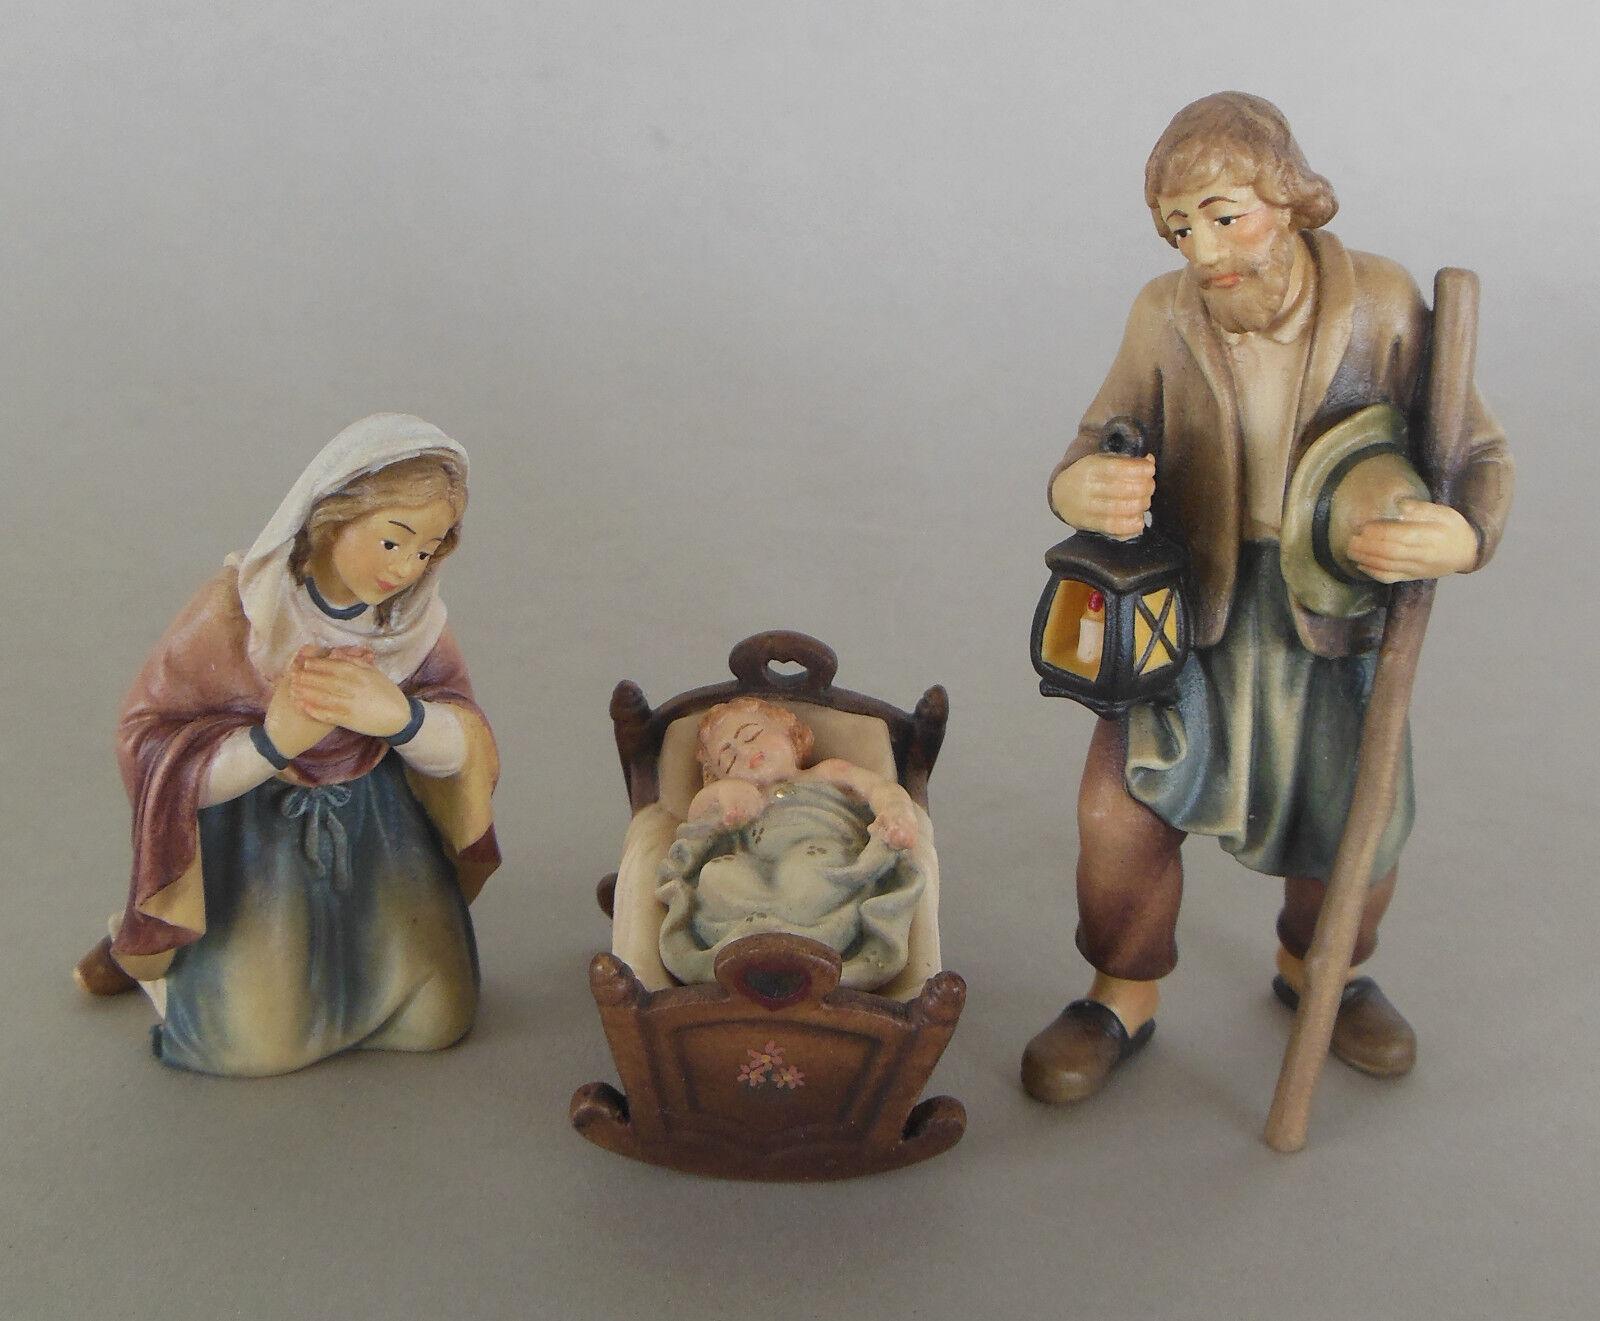 Heilige Familie Wiege Kind schlafend f. Krippenfiguren Größe 10 cm Holz bemalt